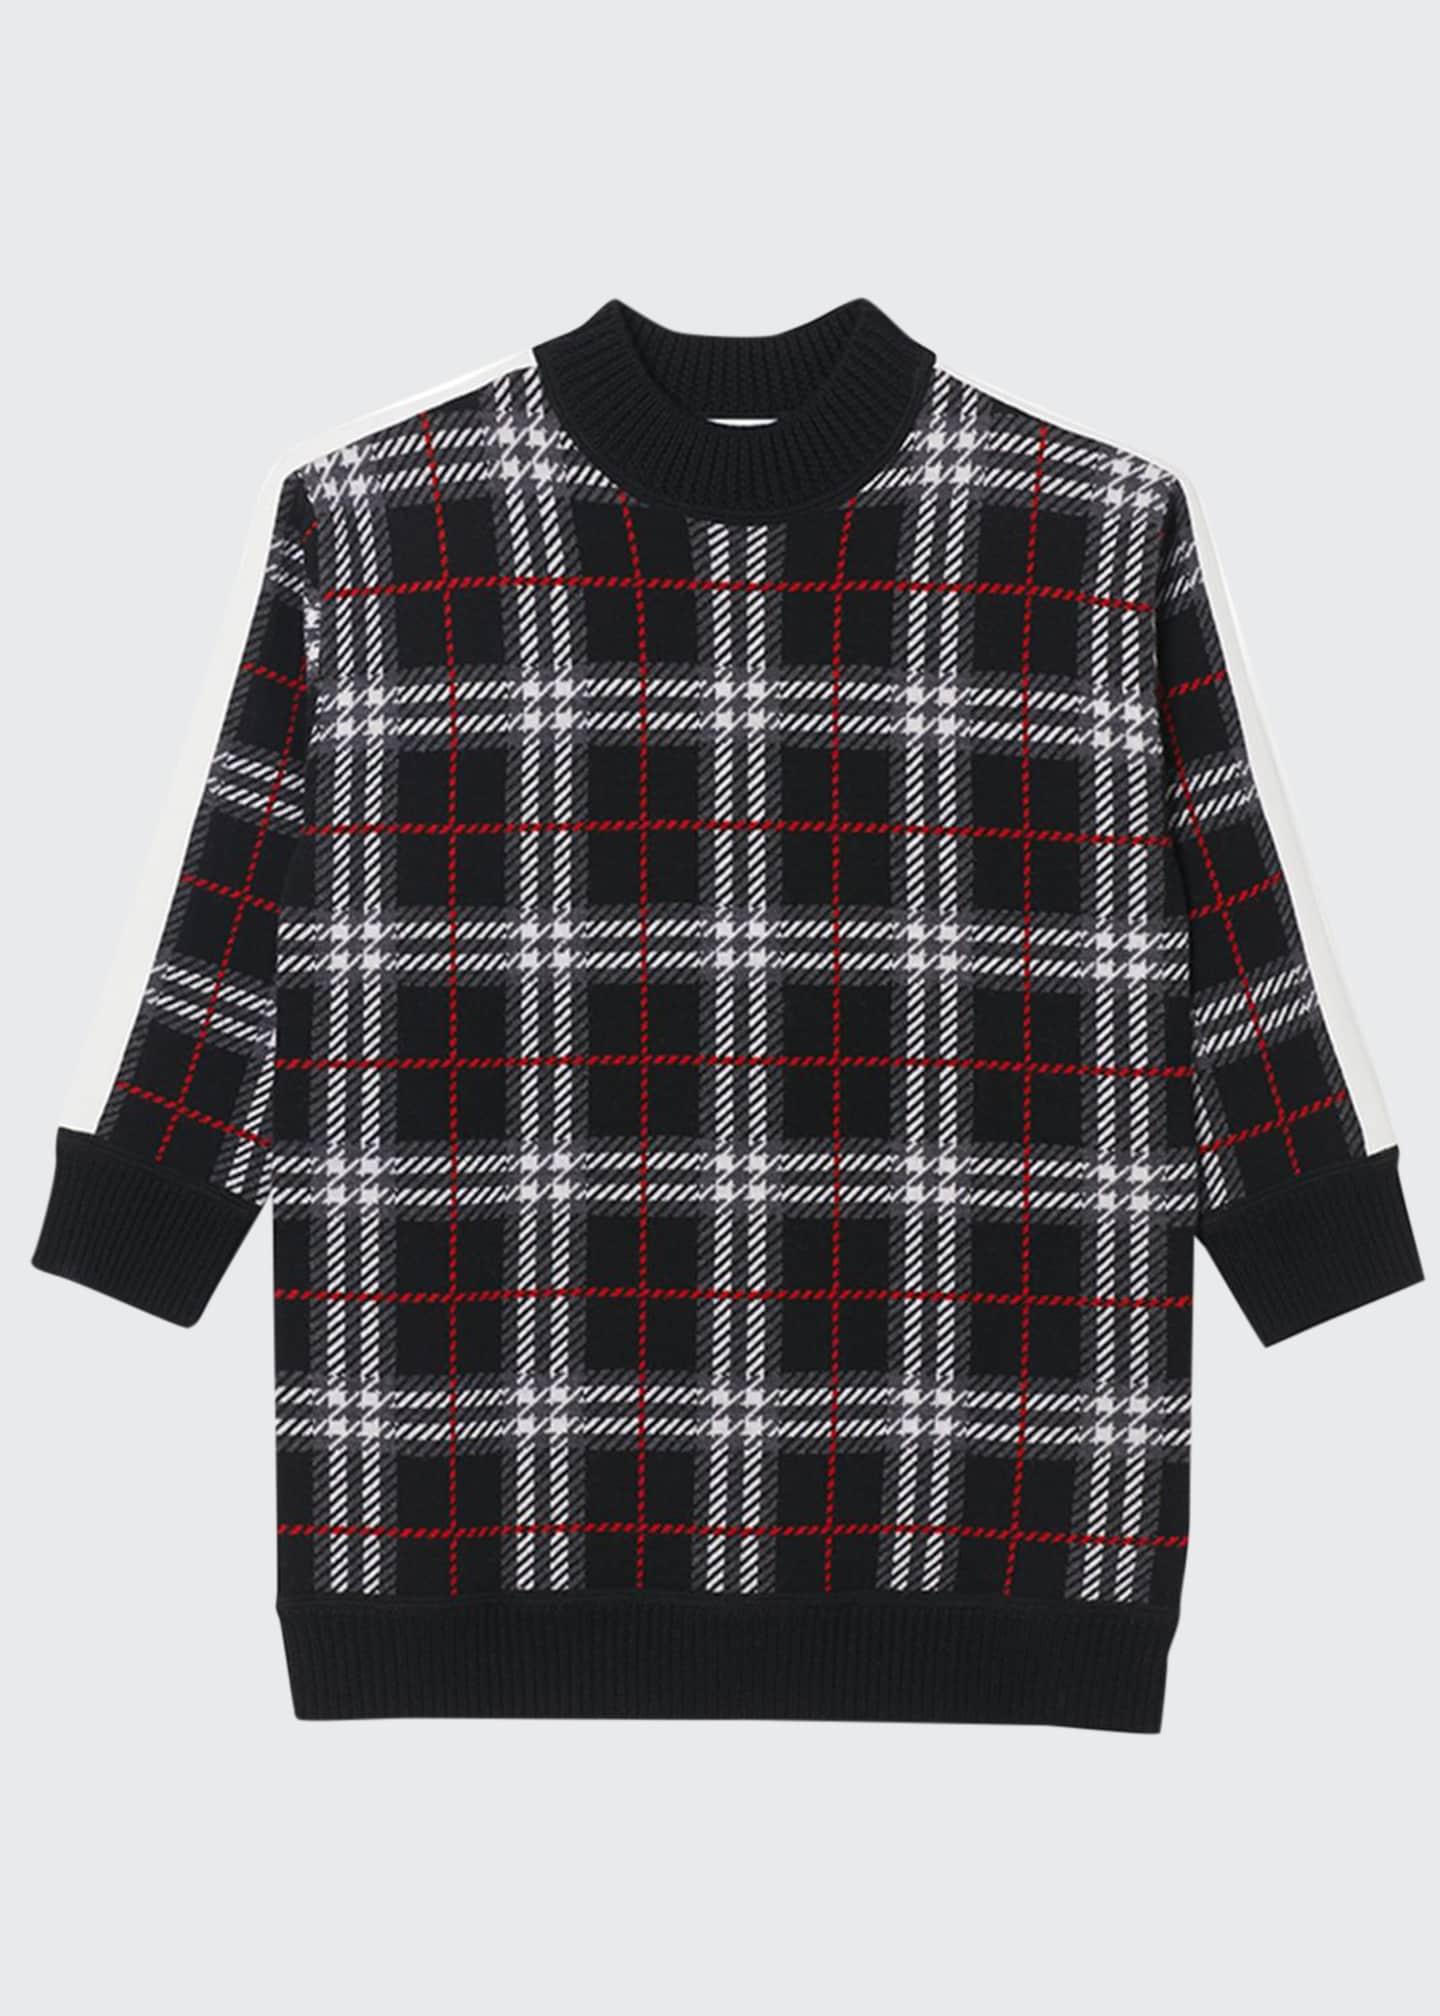 Burberry Girl's Kristin Check Intarsia Sweater Dress, Size